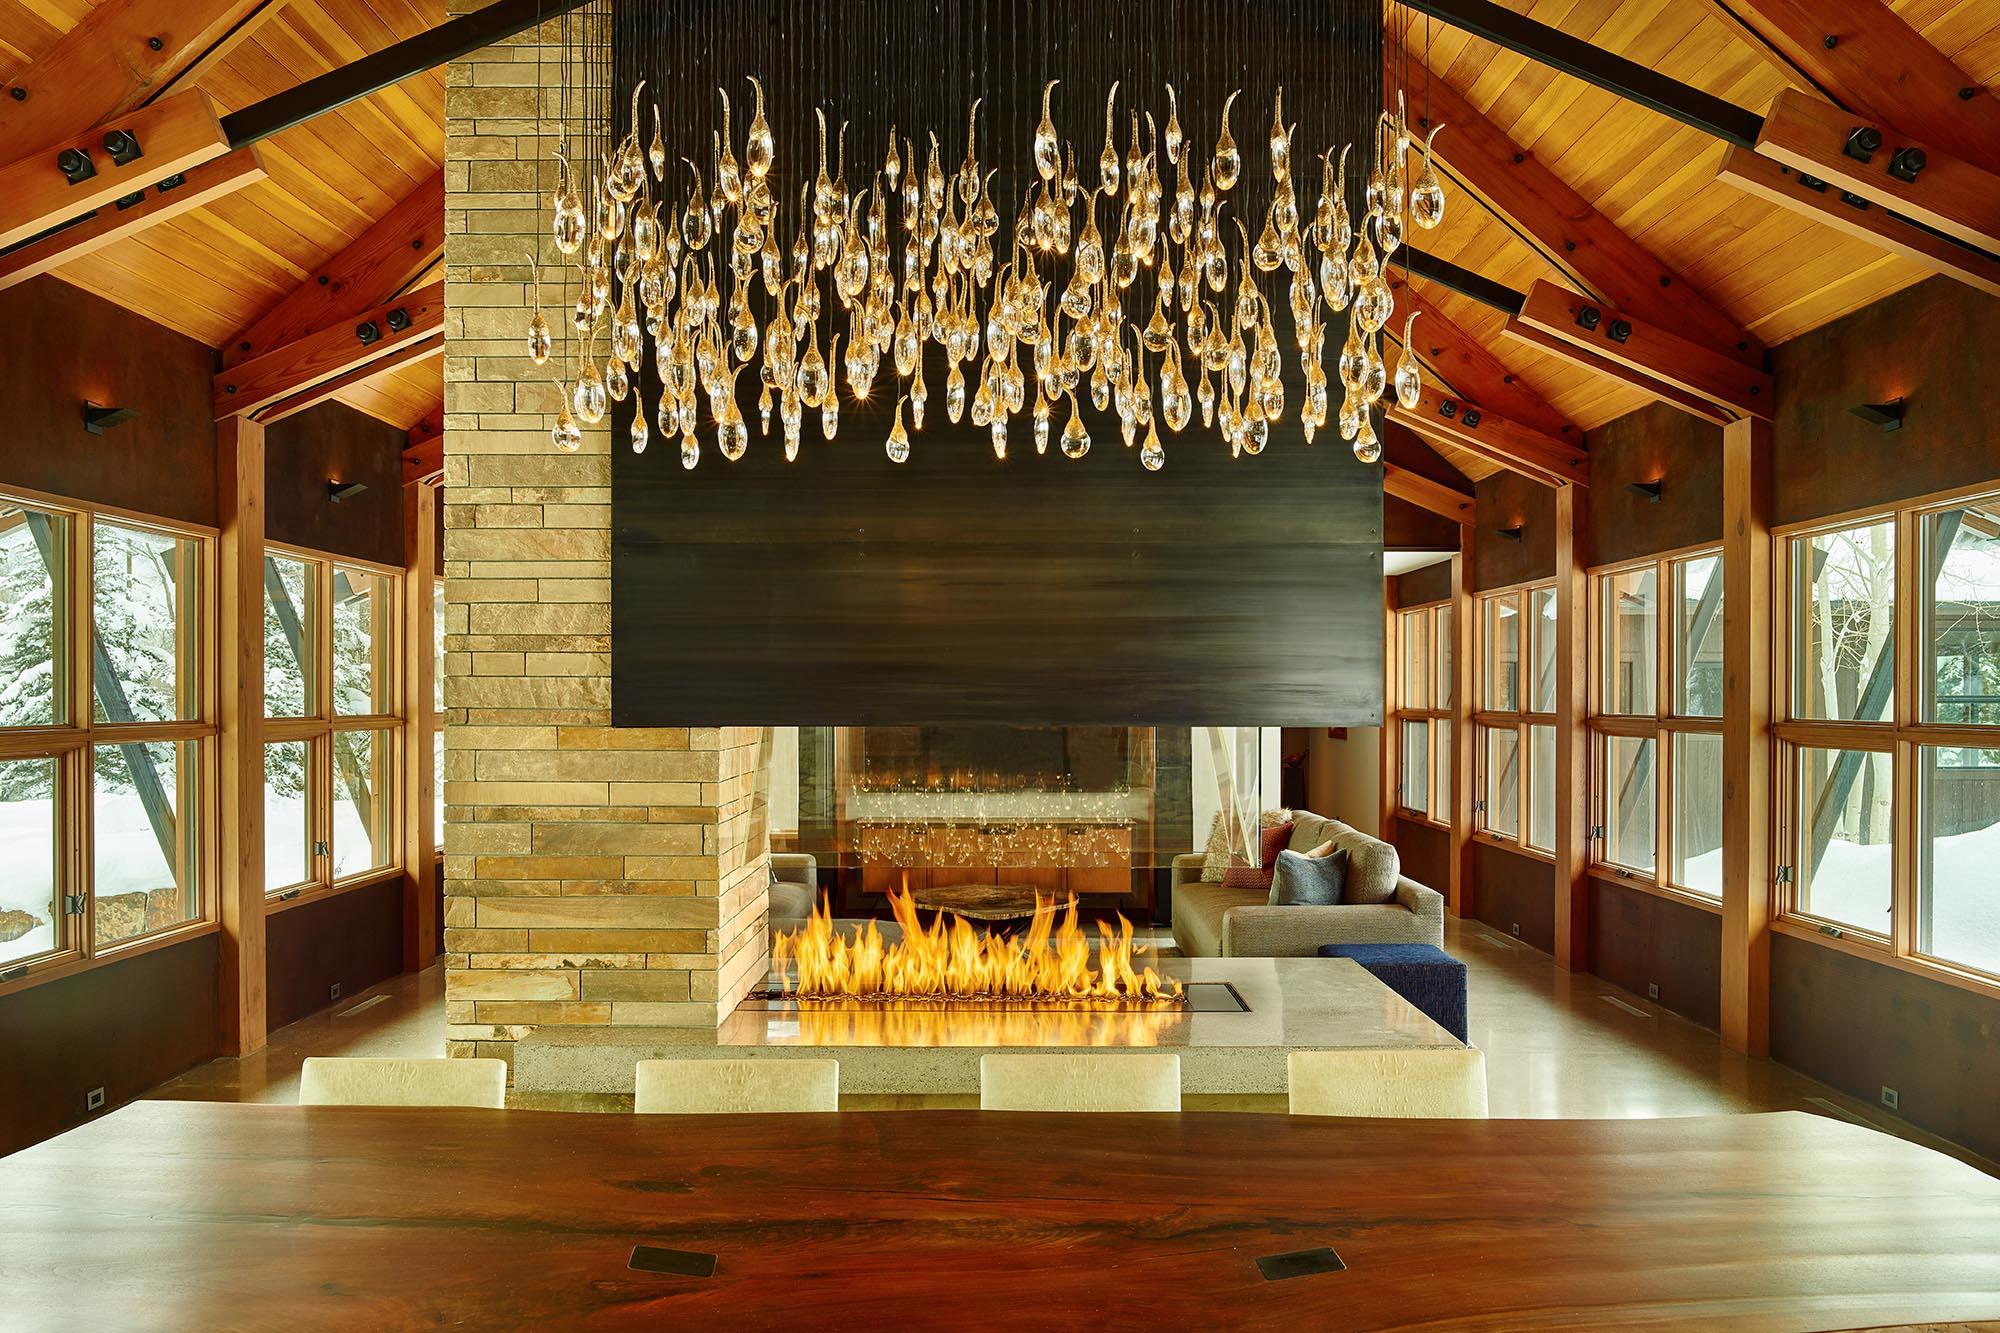 Wildernest Ranch - Jackson Hole Showcase of Homes